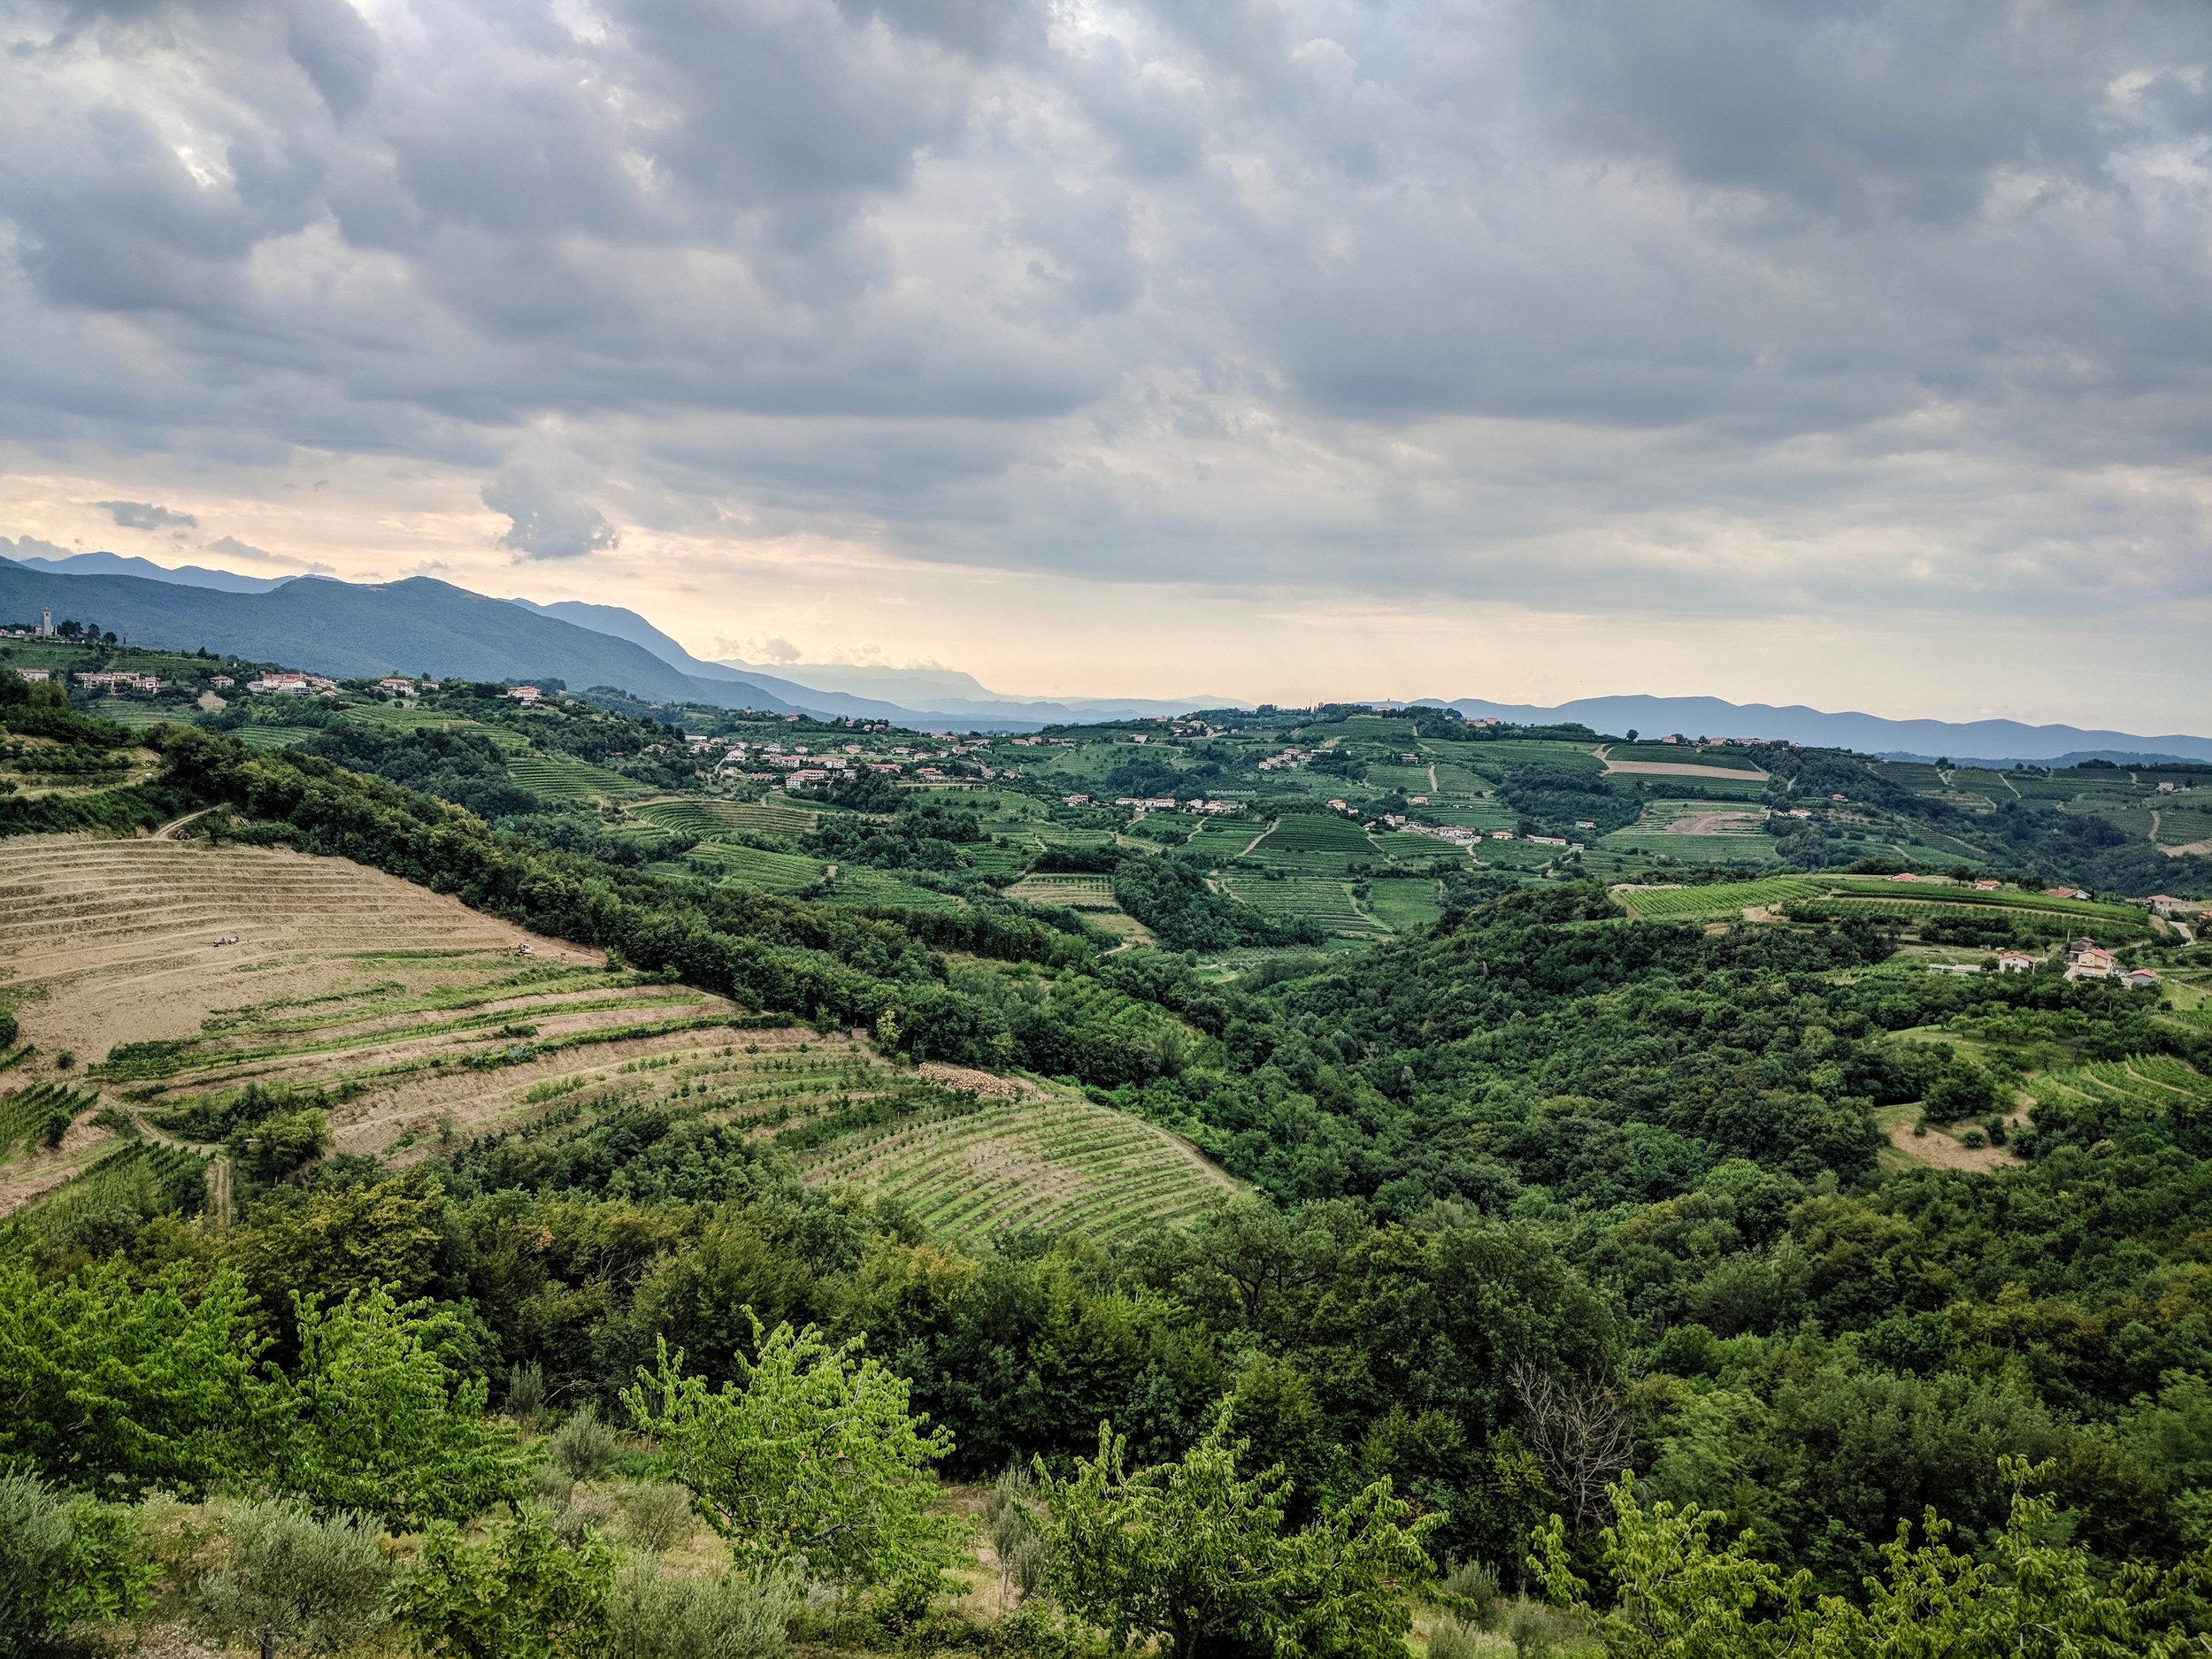 View from the San Martin Hotel located in Brda, the Slovenia wine region